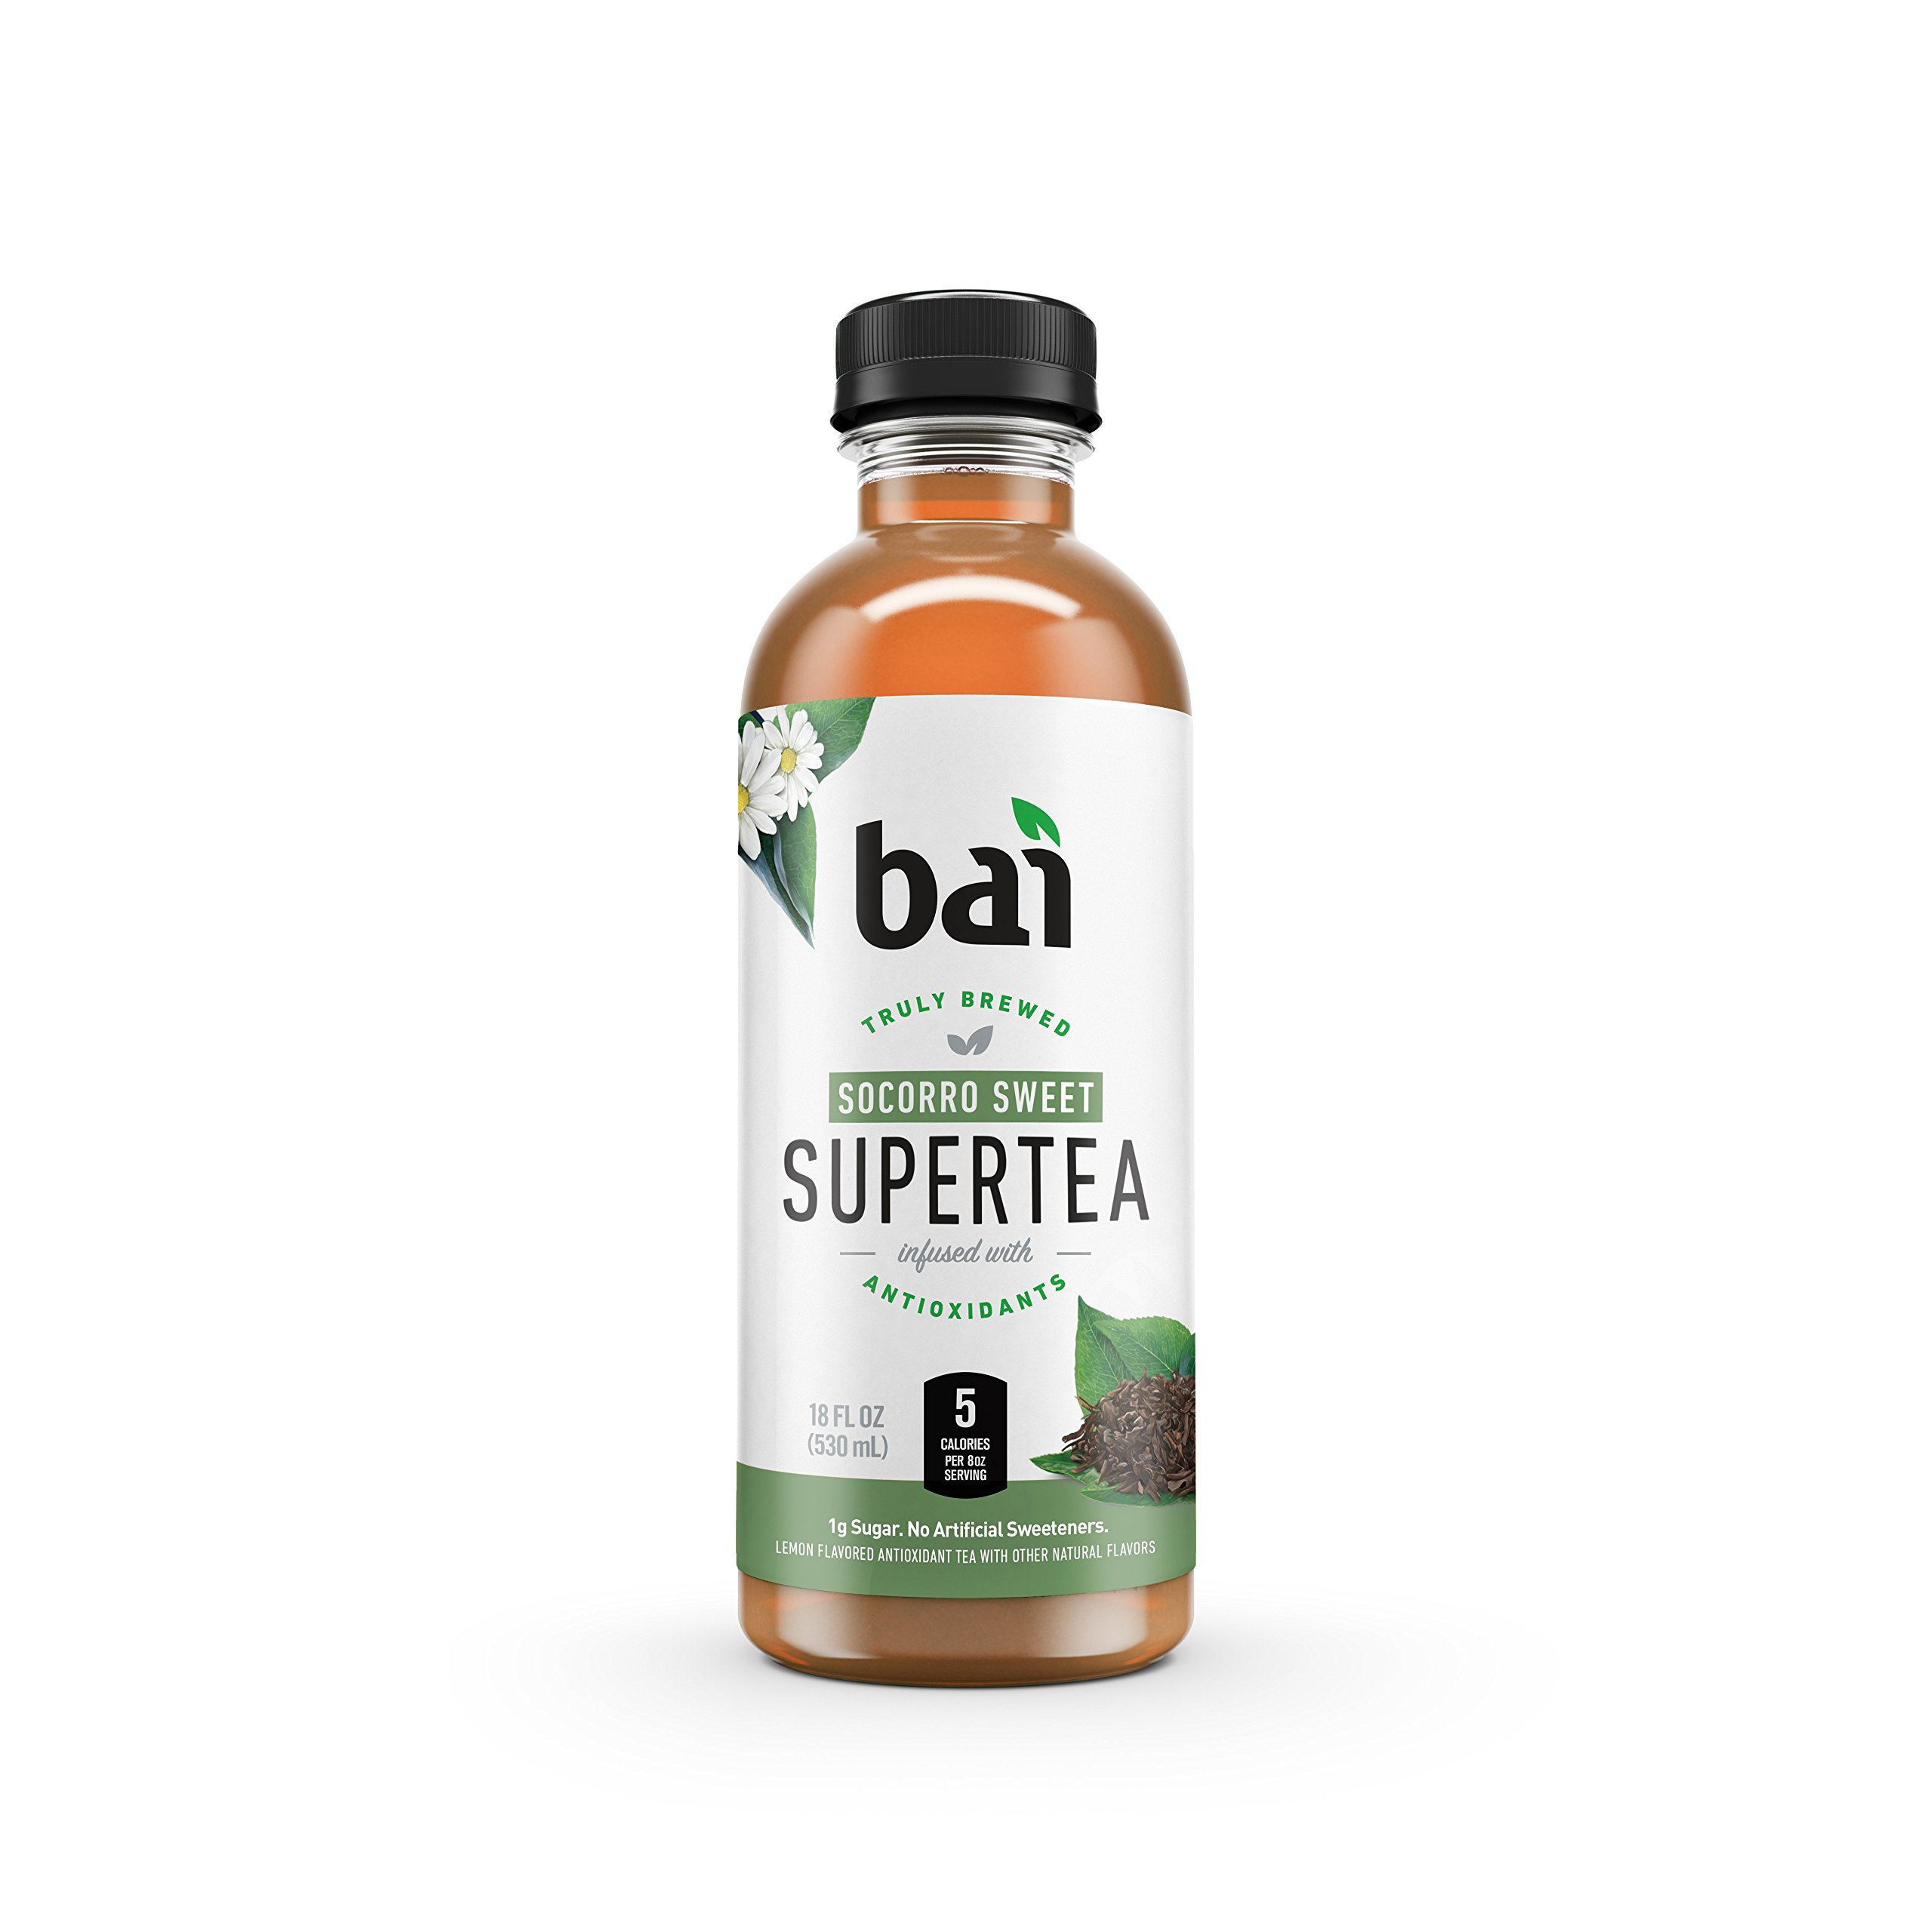 Bai Iced Tea, Socorro Sweet, Antioxidant Infused Supertea, Crafted with Real Tea (Black Tea, White Tea), 18 Fluid Ounce Bottles, 12 count by BAI